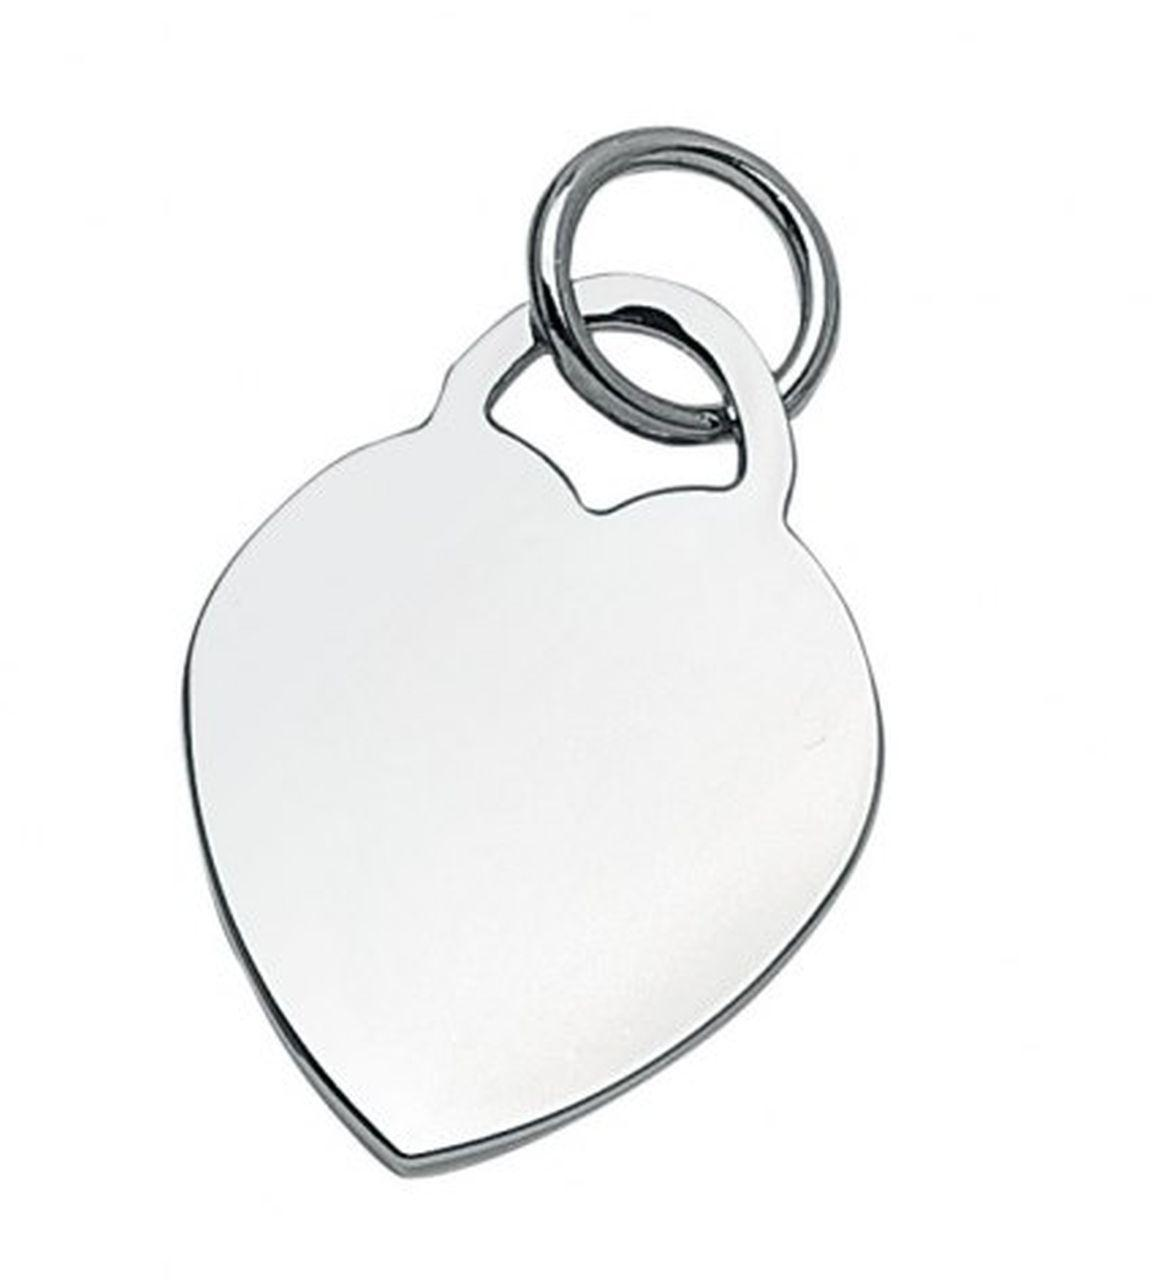 Piastrina charms cuore cm.2,8x2,1x0,2h